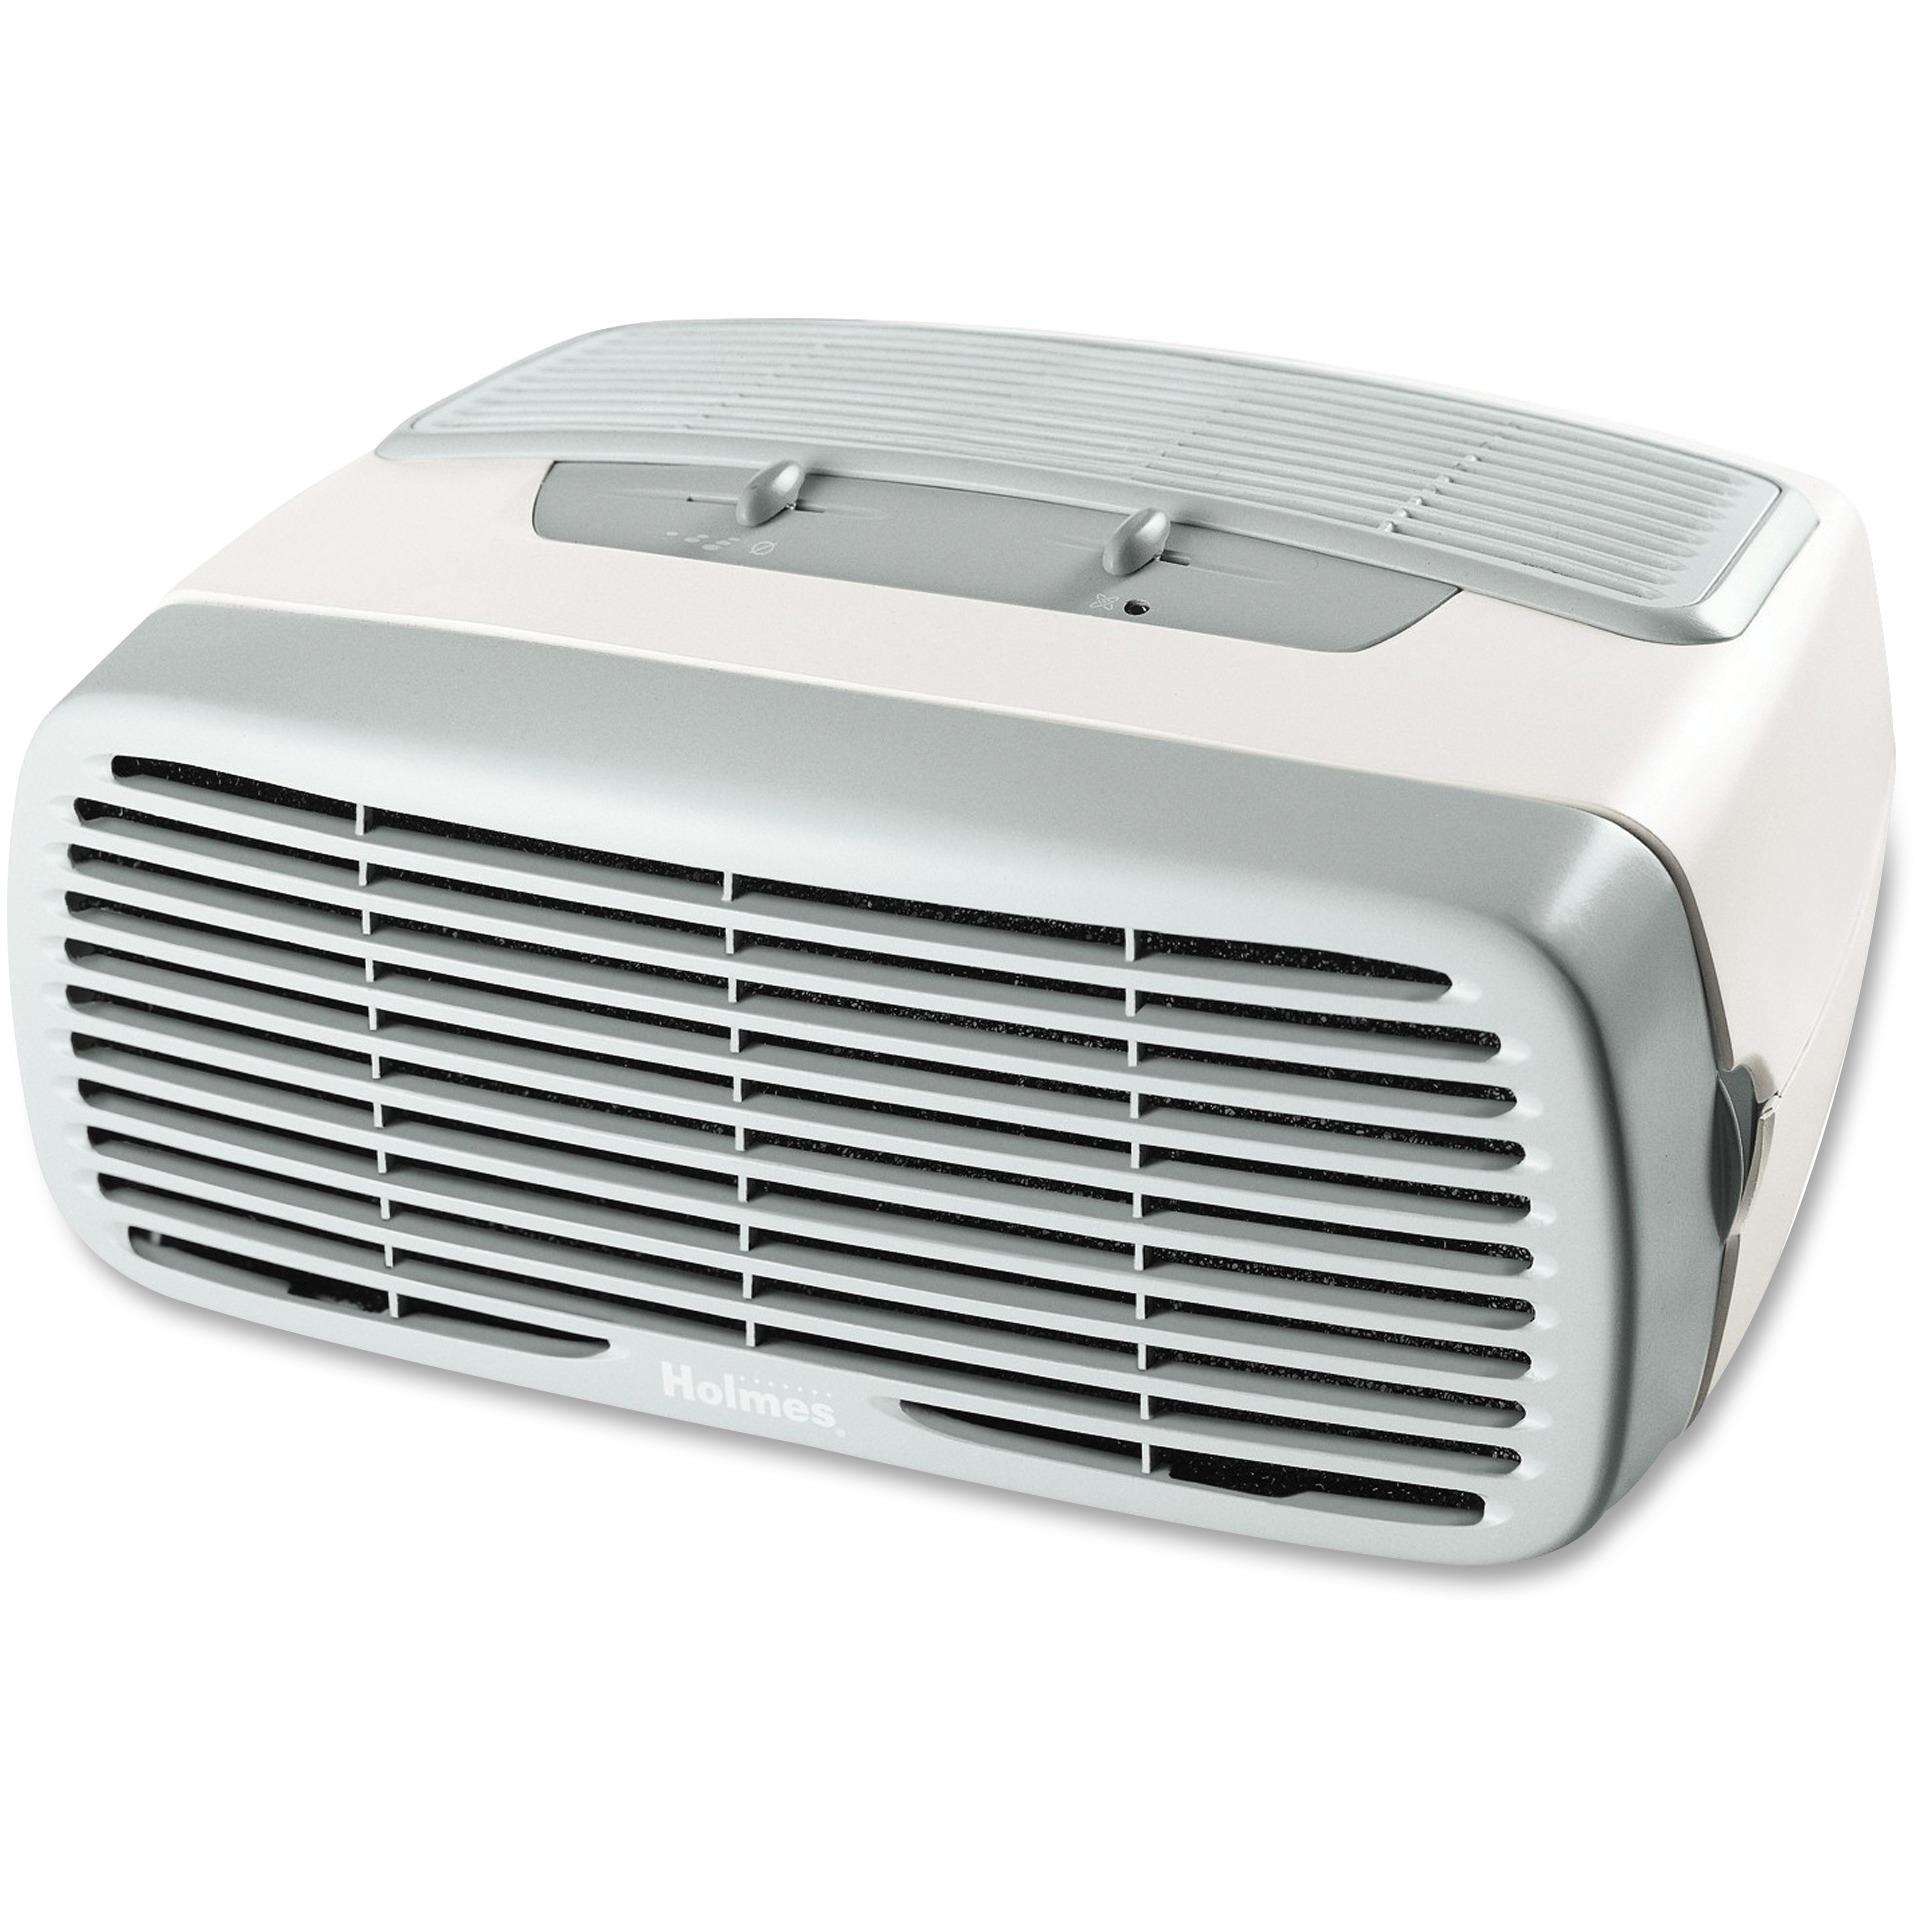 Review of High-Efficiency HEPA-Type Desktop Air Purifier, Carbon Filter (HAP242-UC)